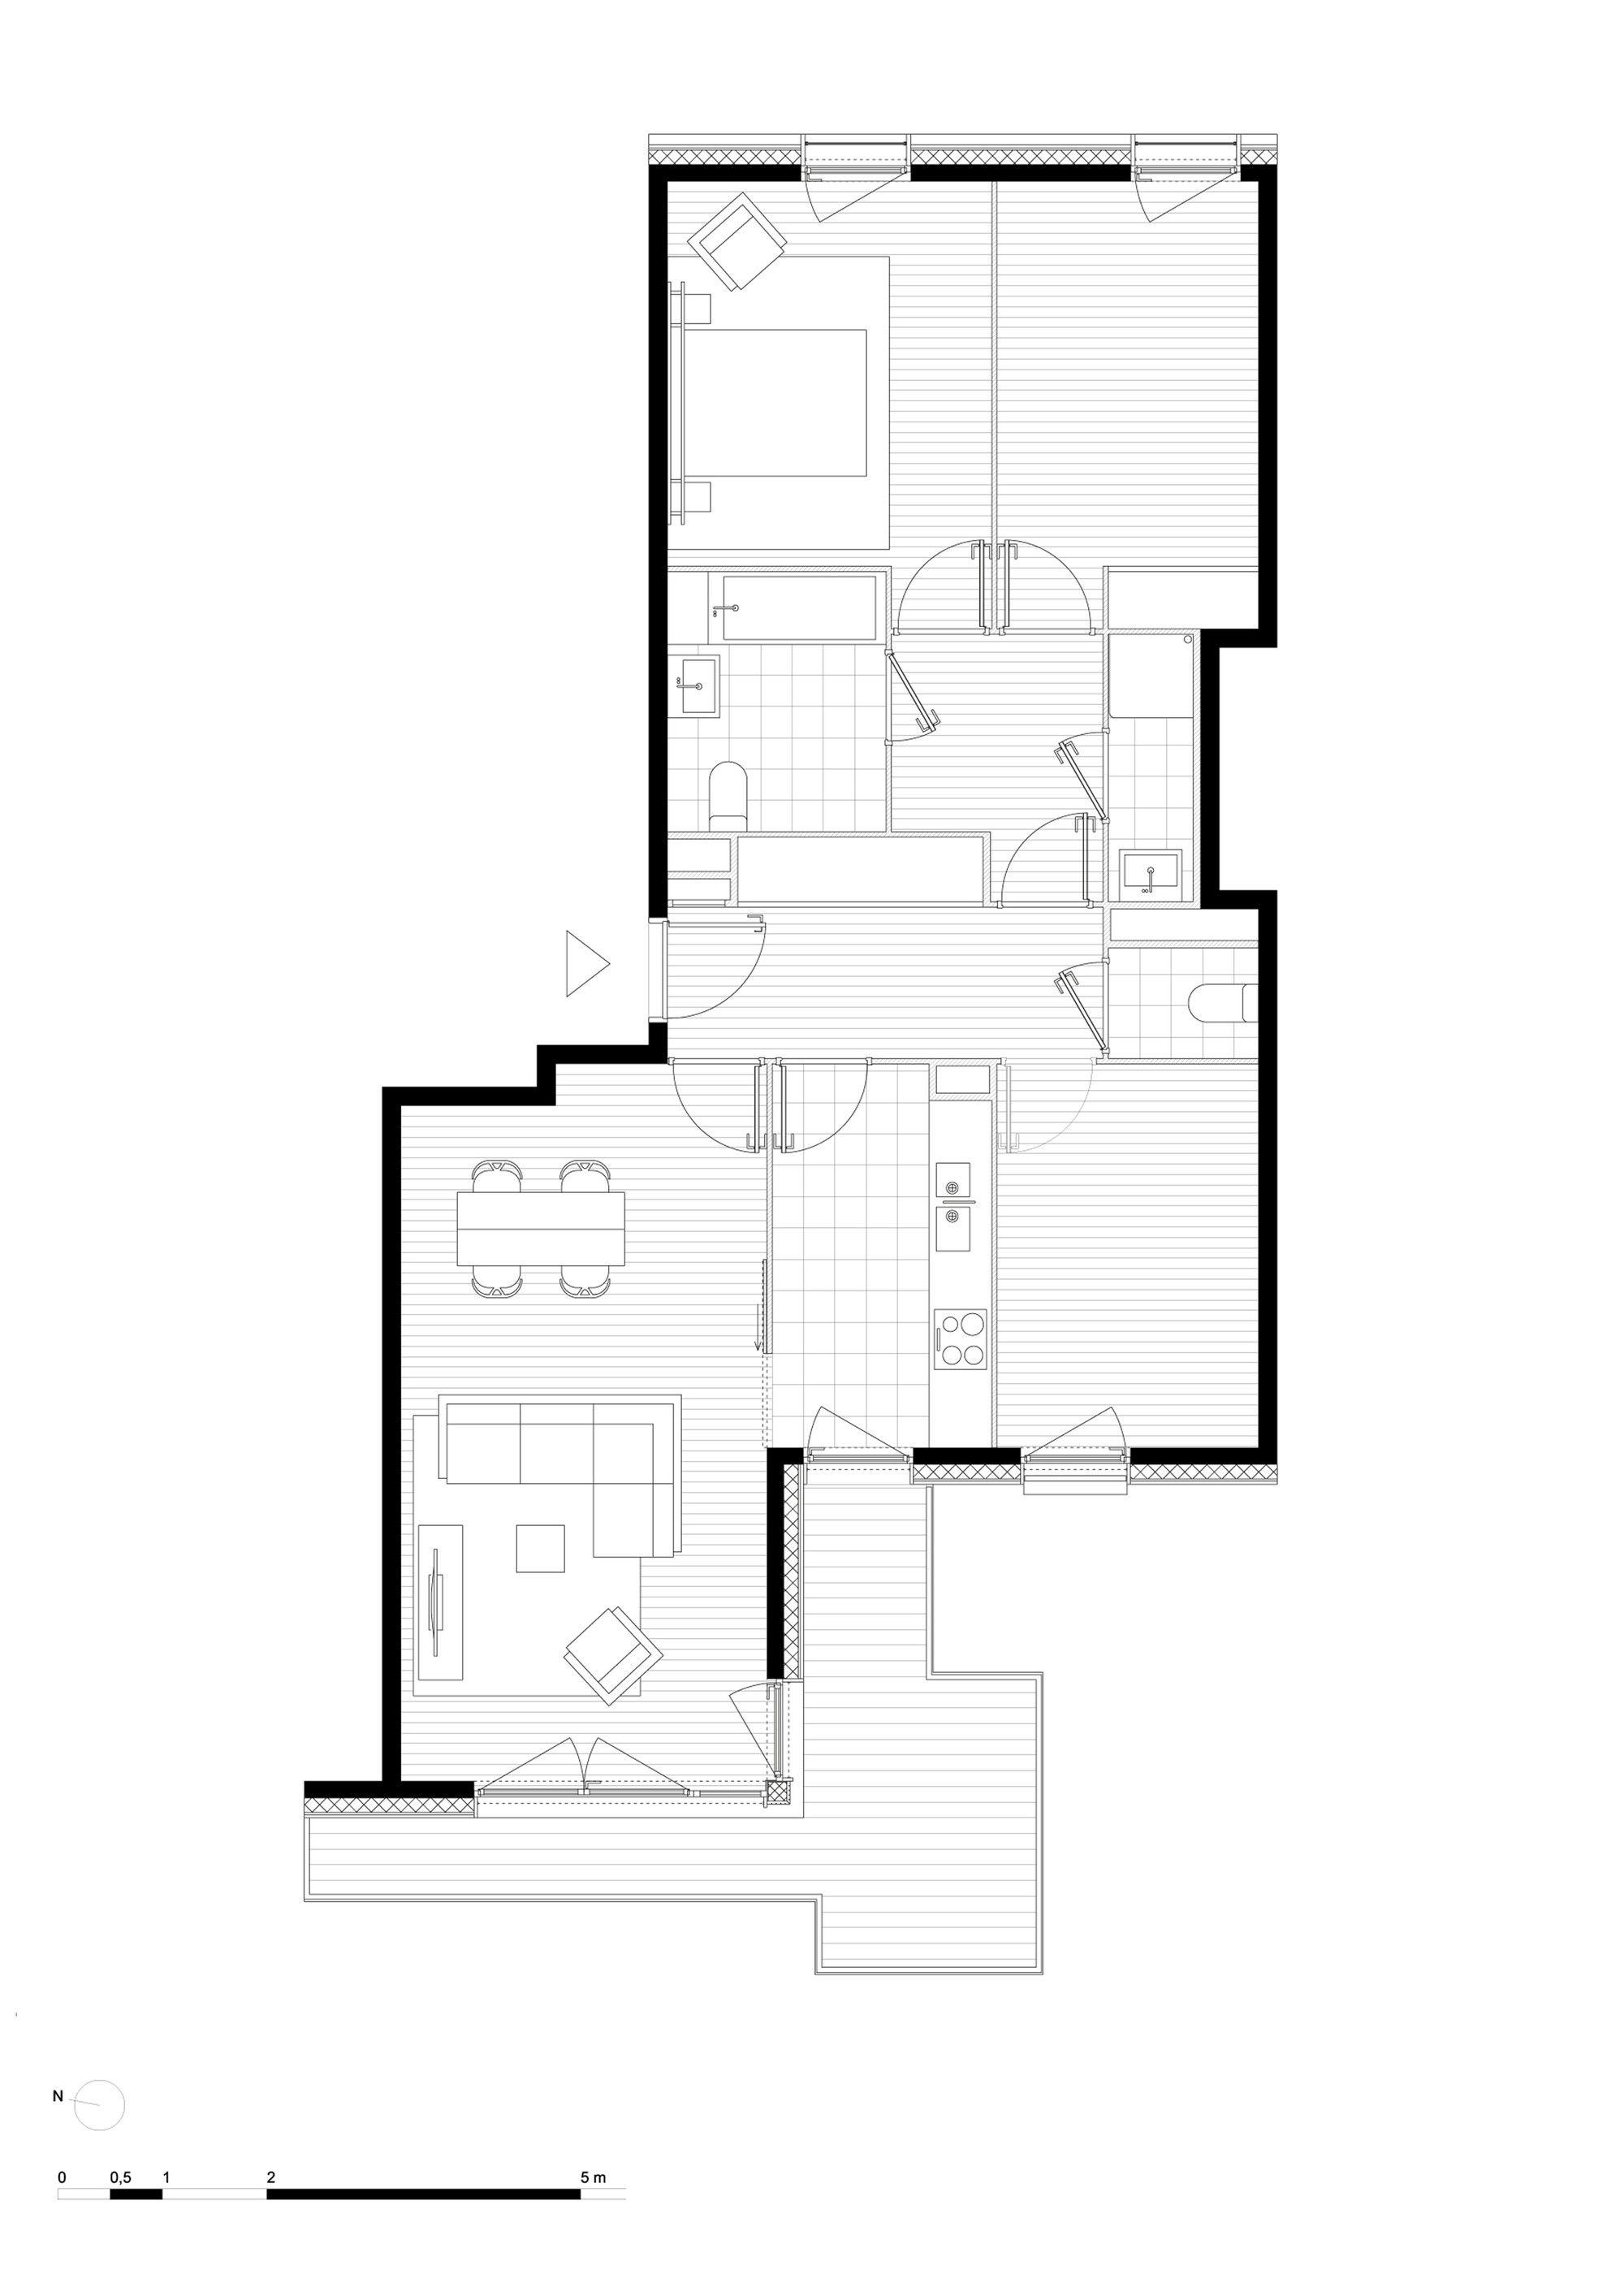 Gallery Of Valenton Housing Gelin Lafon 25 Architecture Floor Plans How To Plan